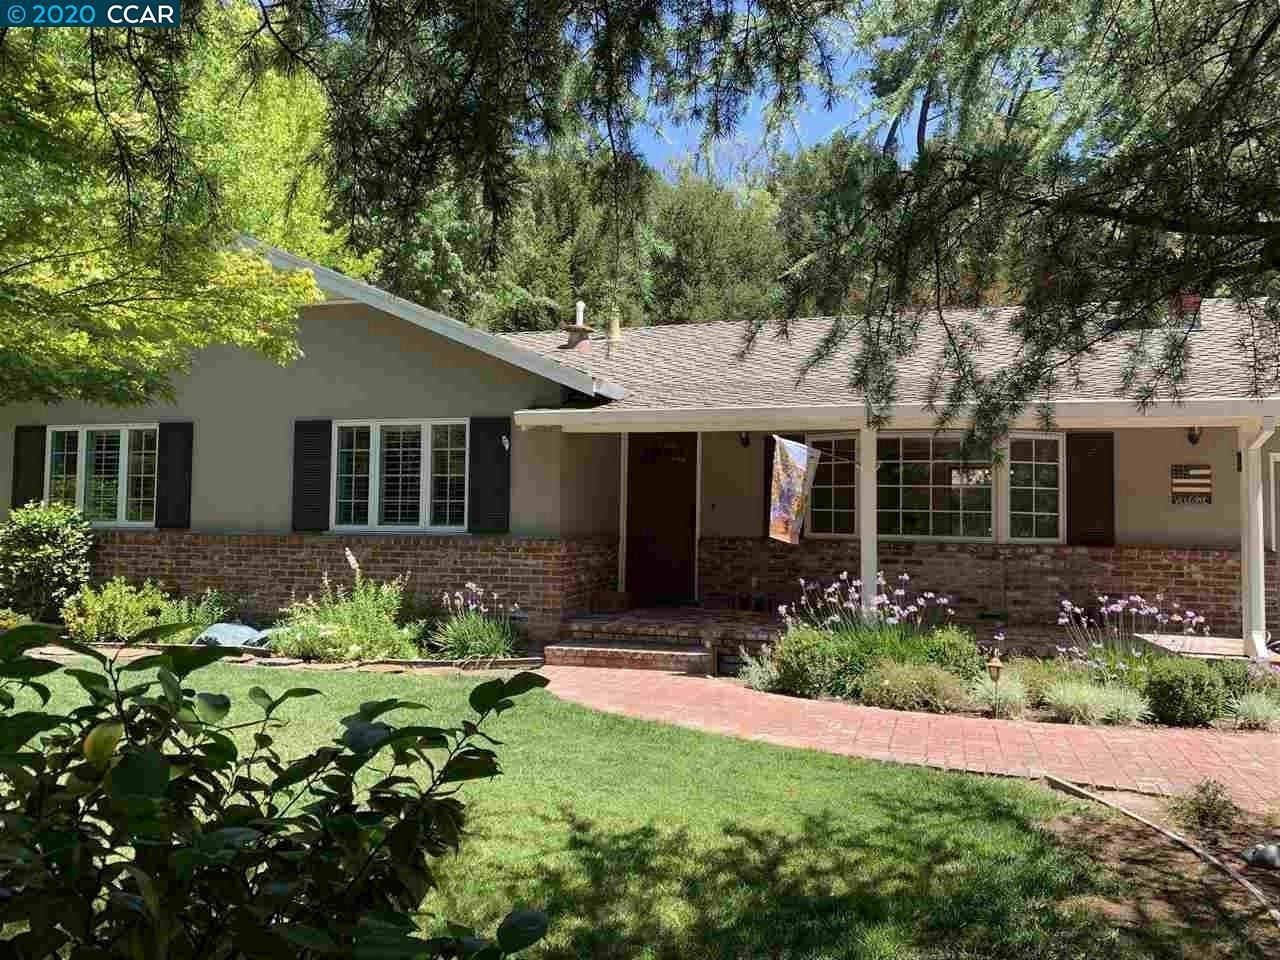 Photo of 237 Overhill Rd, ORINDA, CA 94563 (MLS # 40911527)